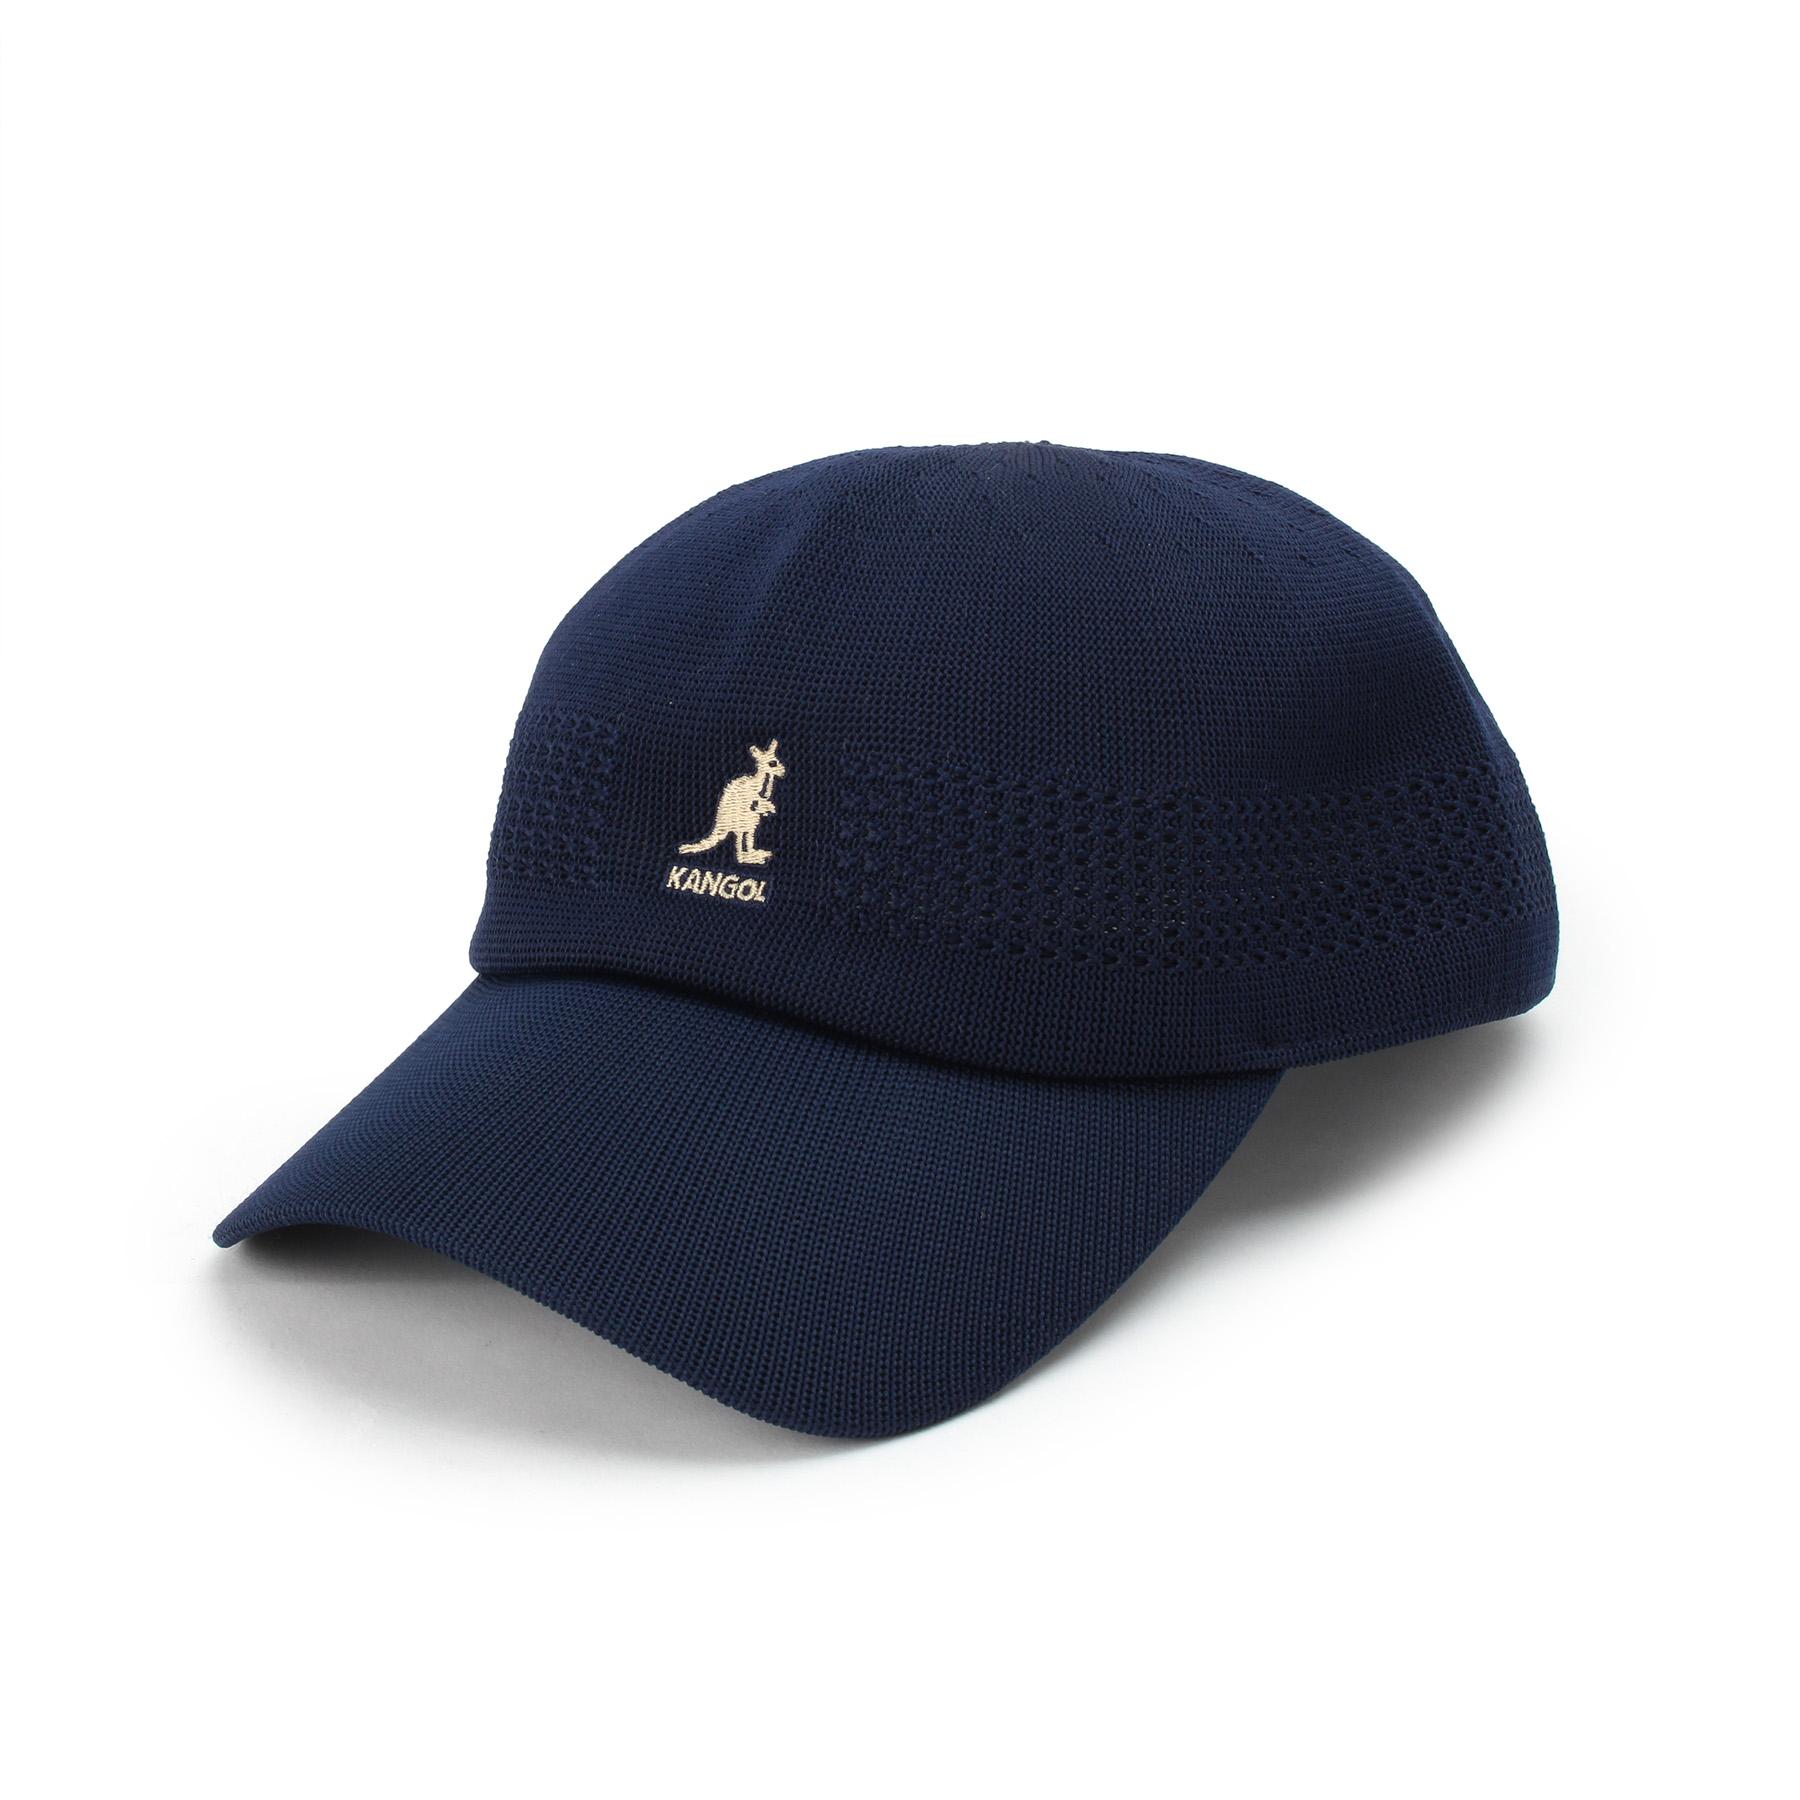 【BASECONTROL (ベース コントロール)】【WEB限定】KANGOL/カンゴール スペースキャップメンズ 帽子|キャップ ネイビー